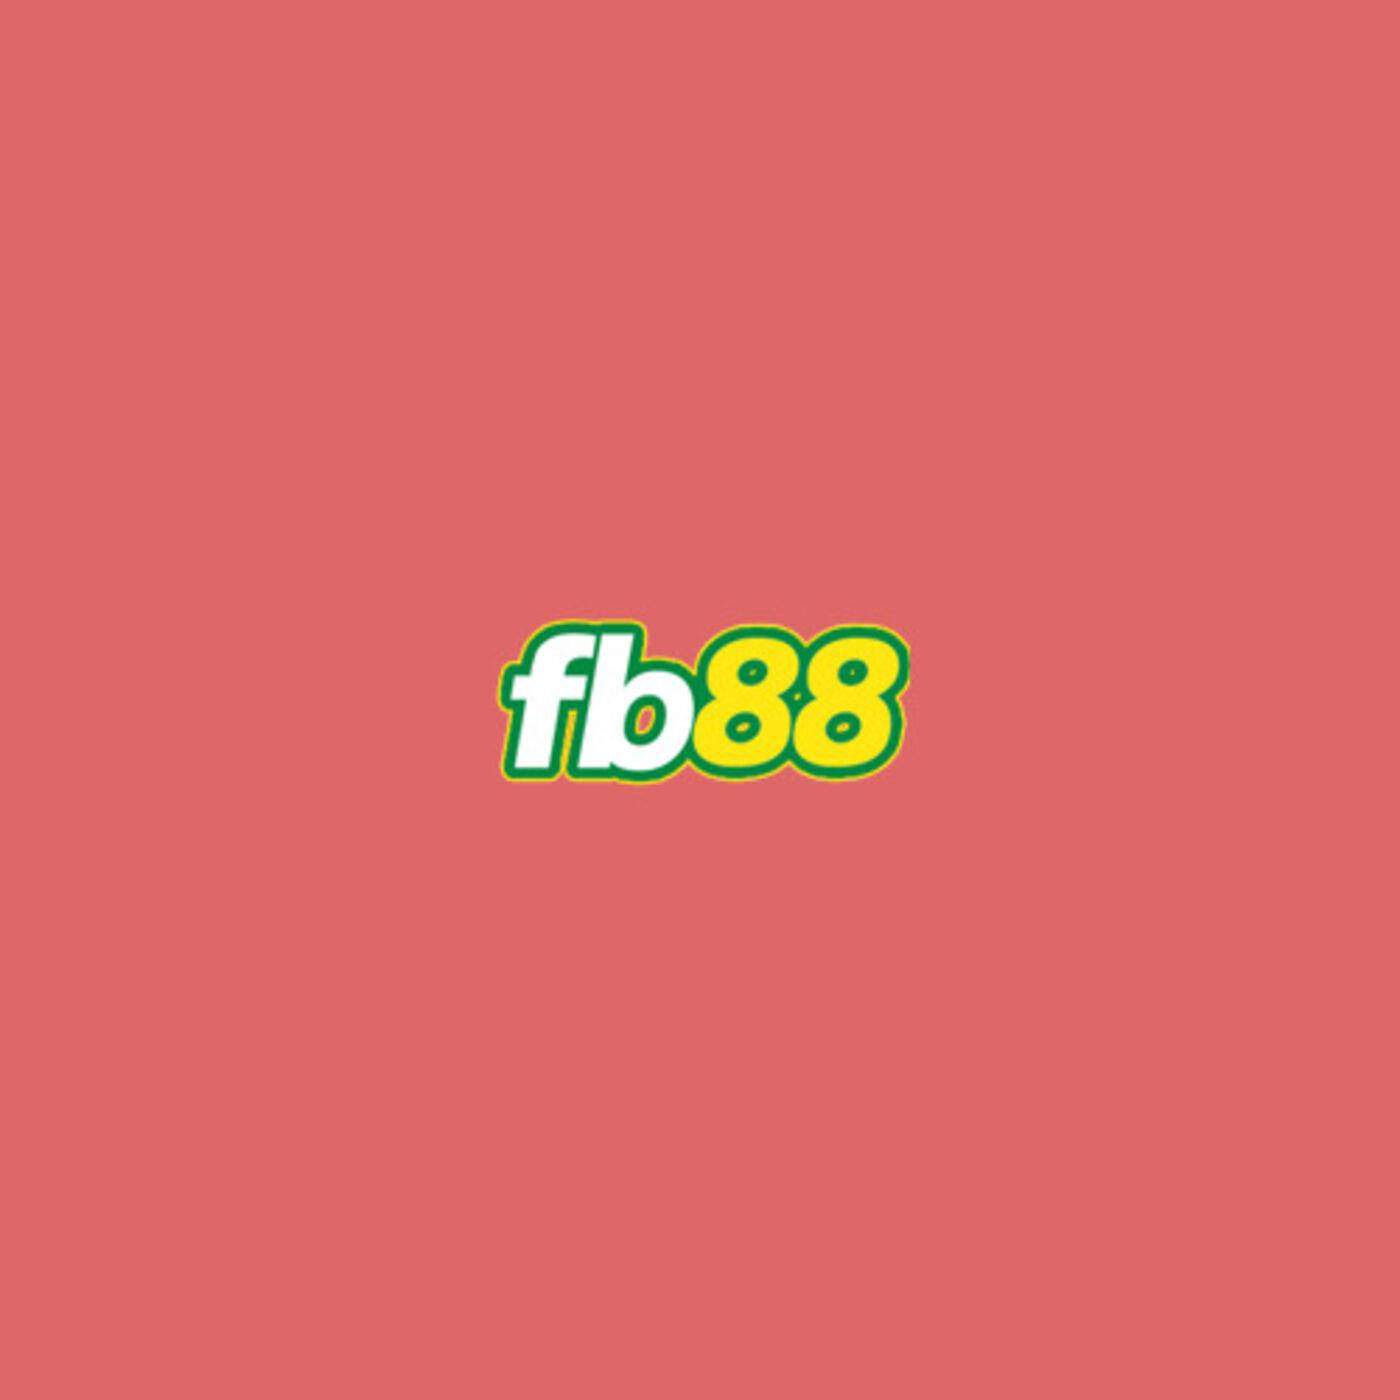 FB88 - Nha Cai Hang Dau Viet Nam